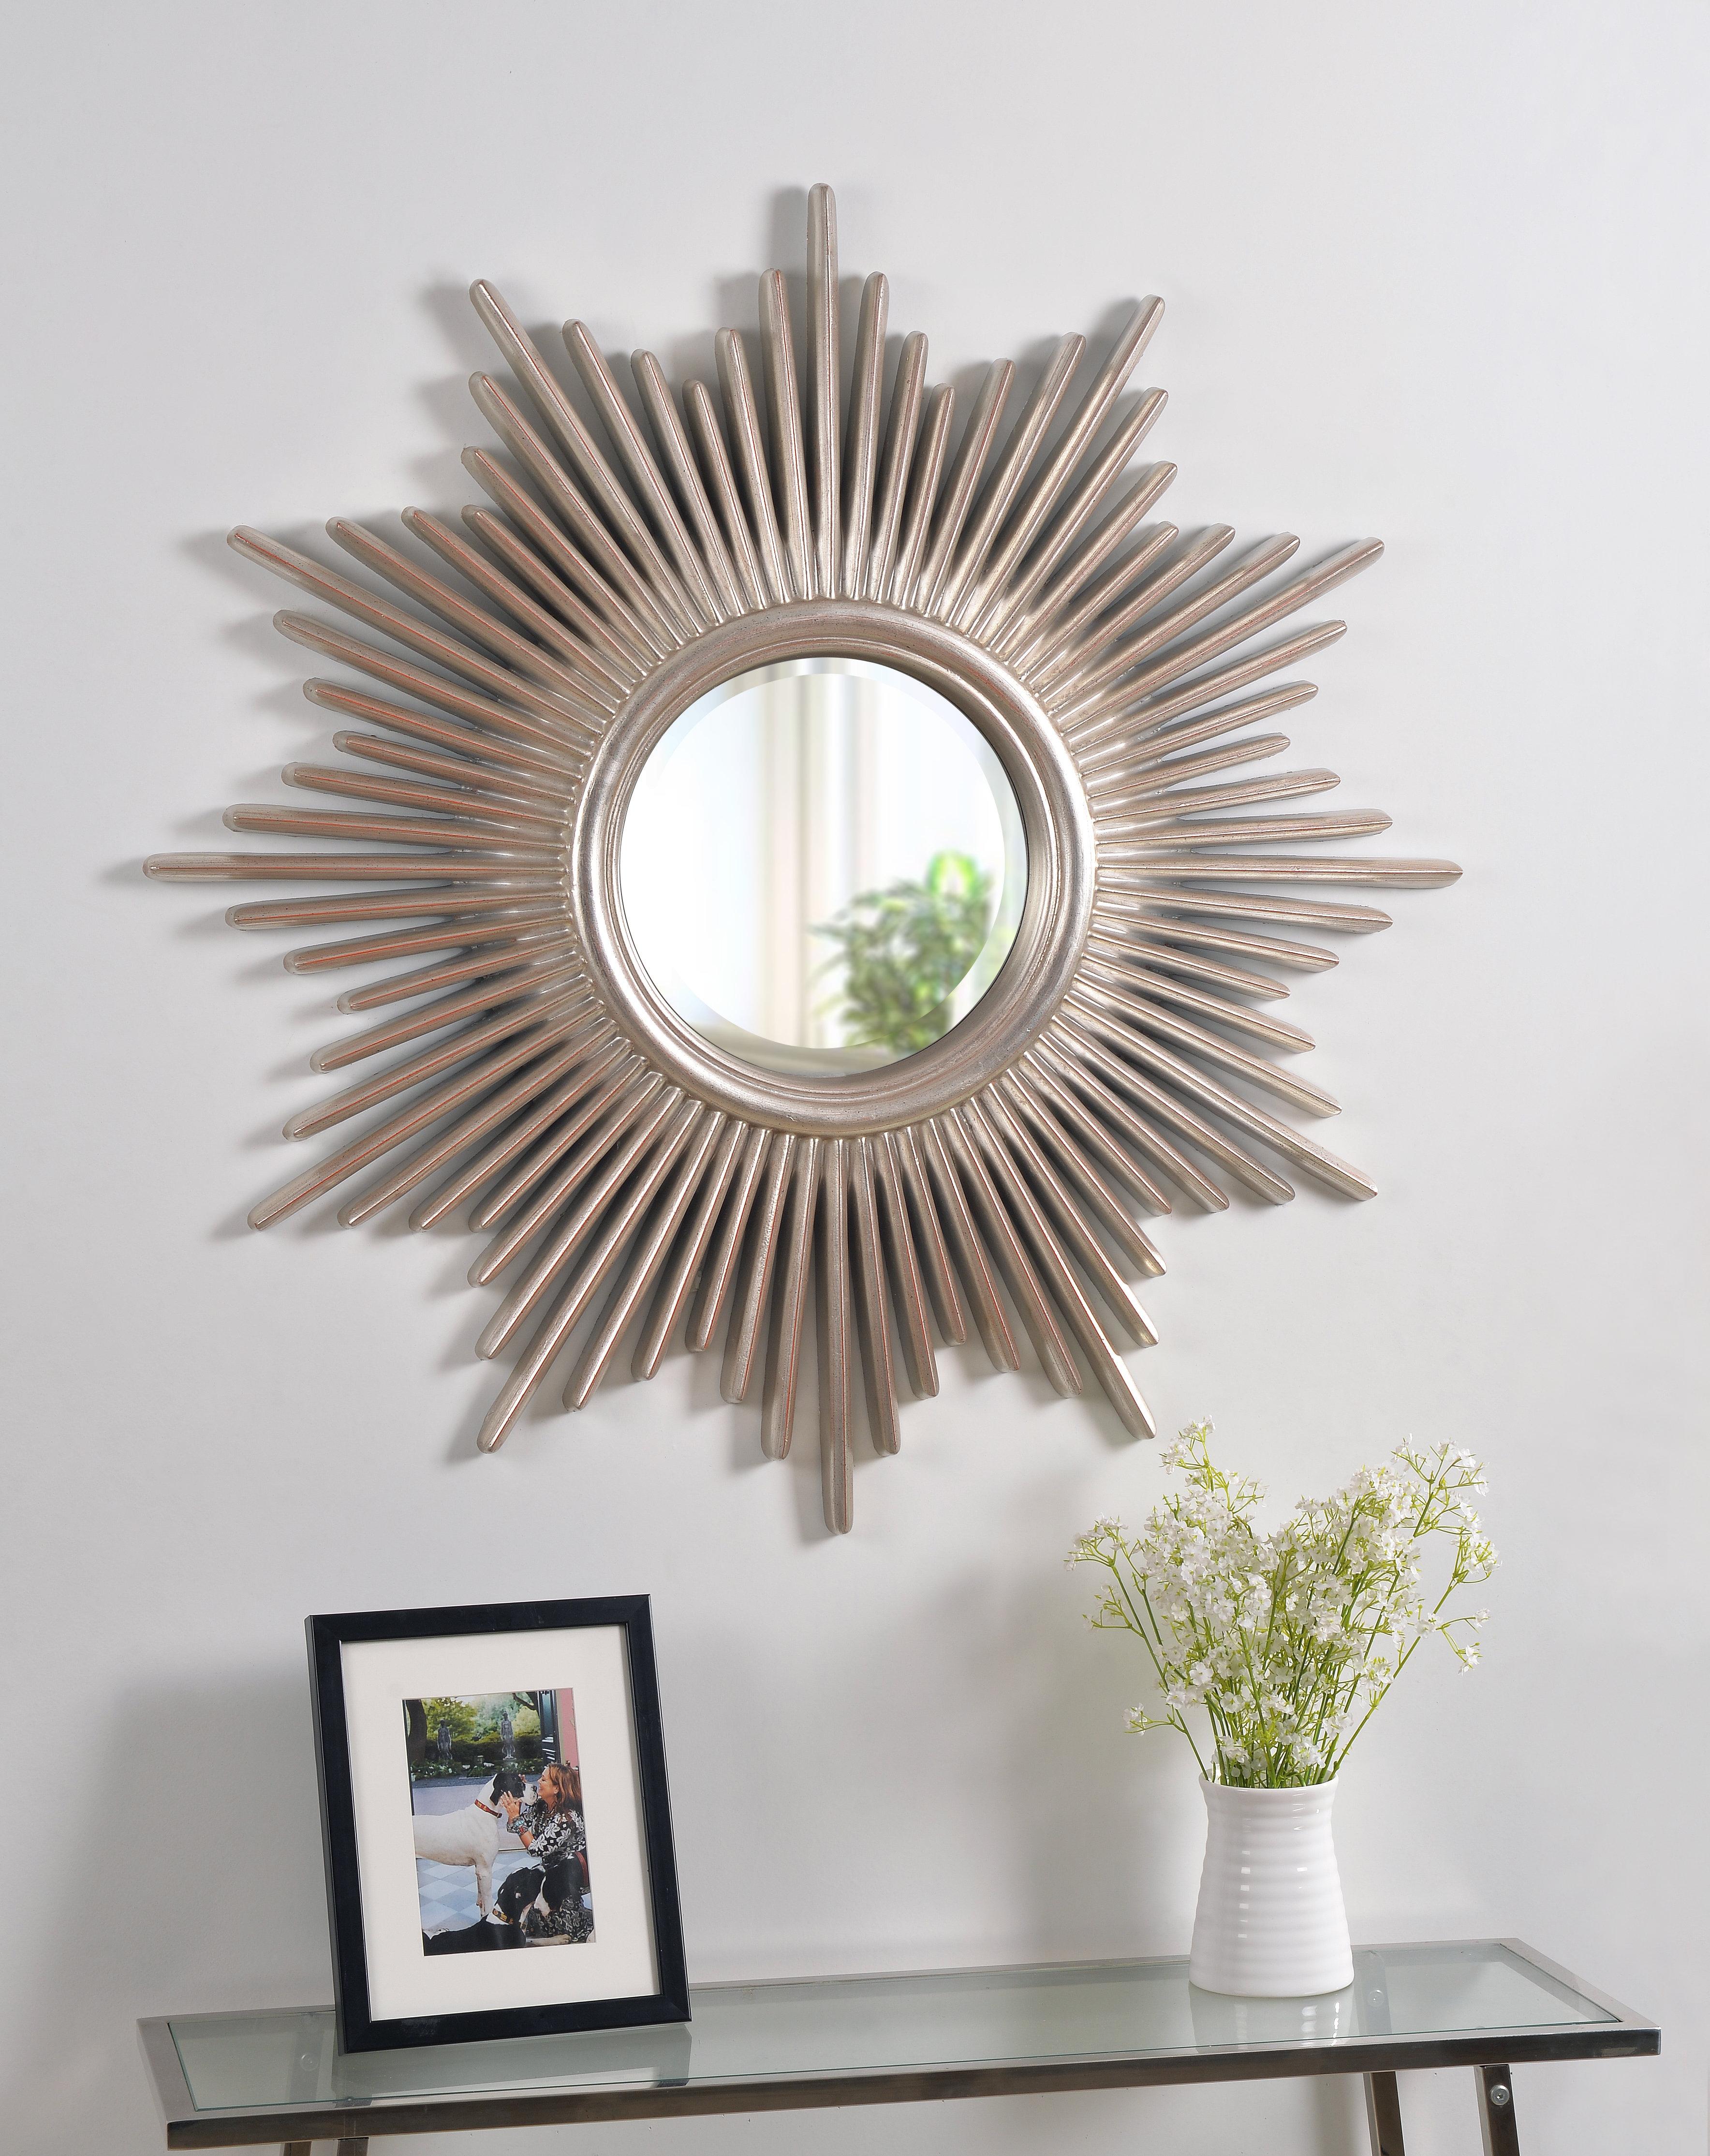 Sunburst Wall Mirrors | Joss & Main With Perillo Burst Wood Accent Mirrors (Image 19 of 20)